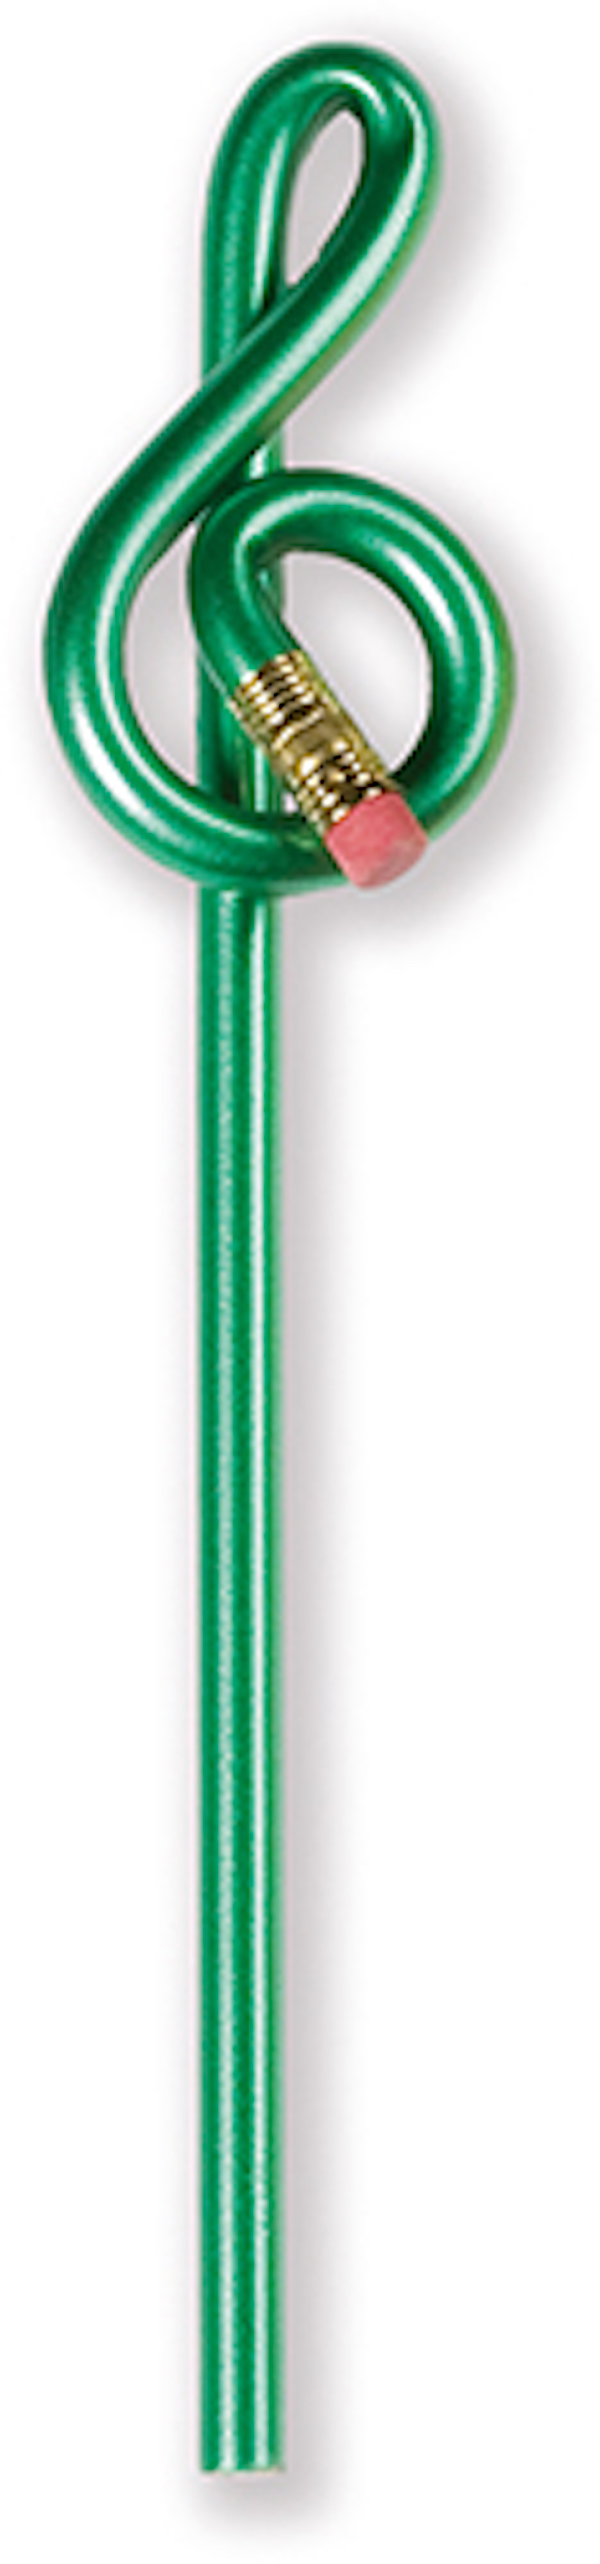 Violinschlüsselbleistift grün